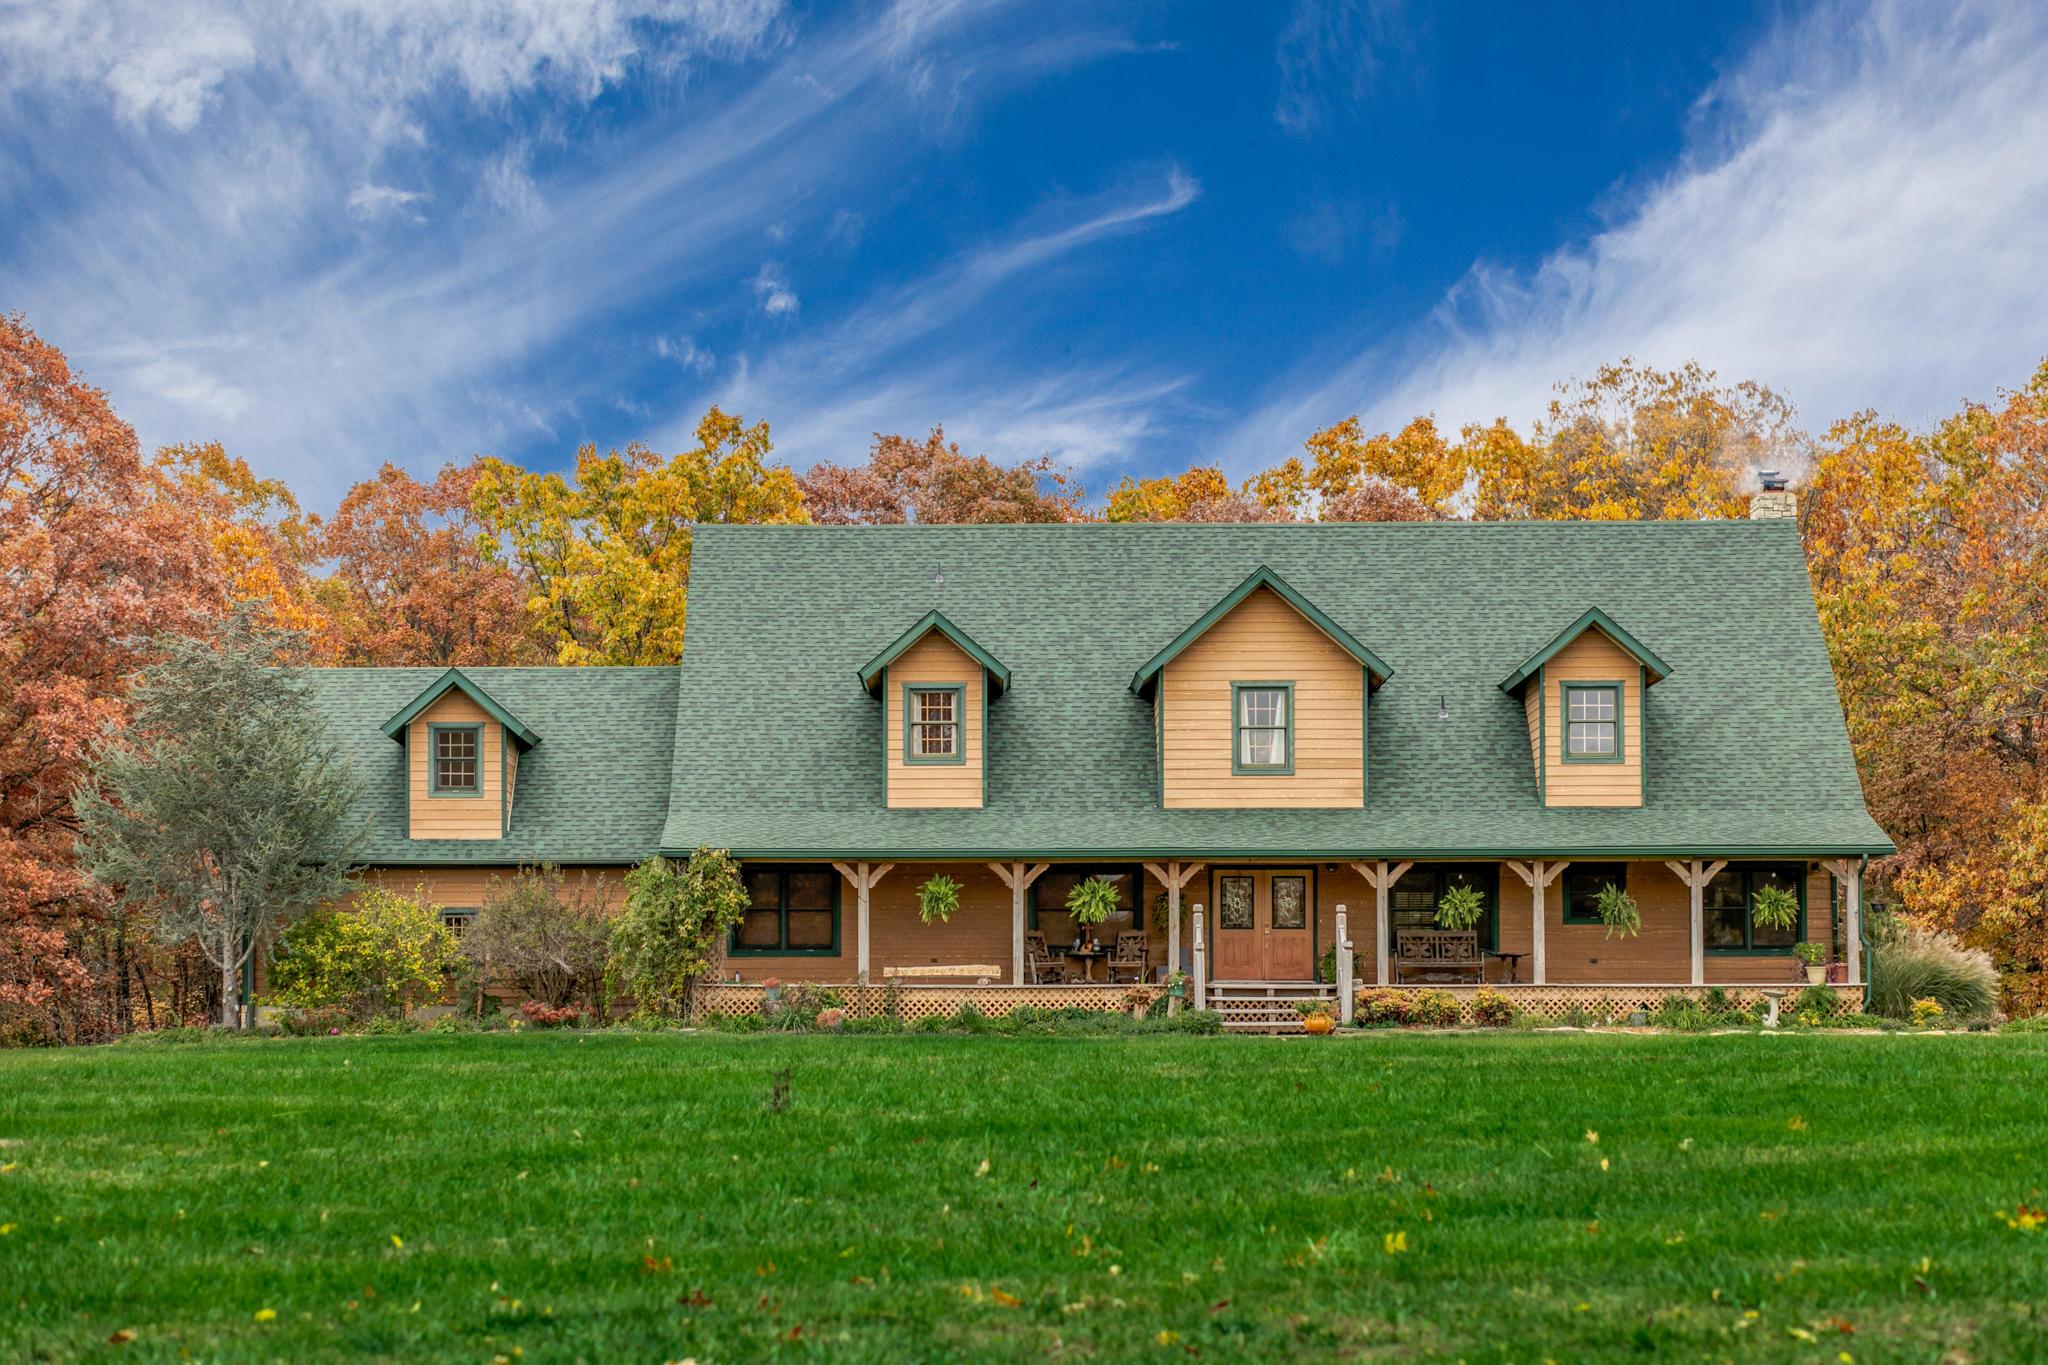 215 Ranch Drive Rogersville, MO 65742